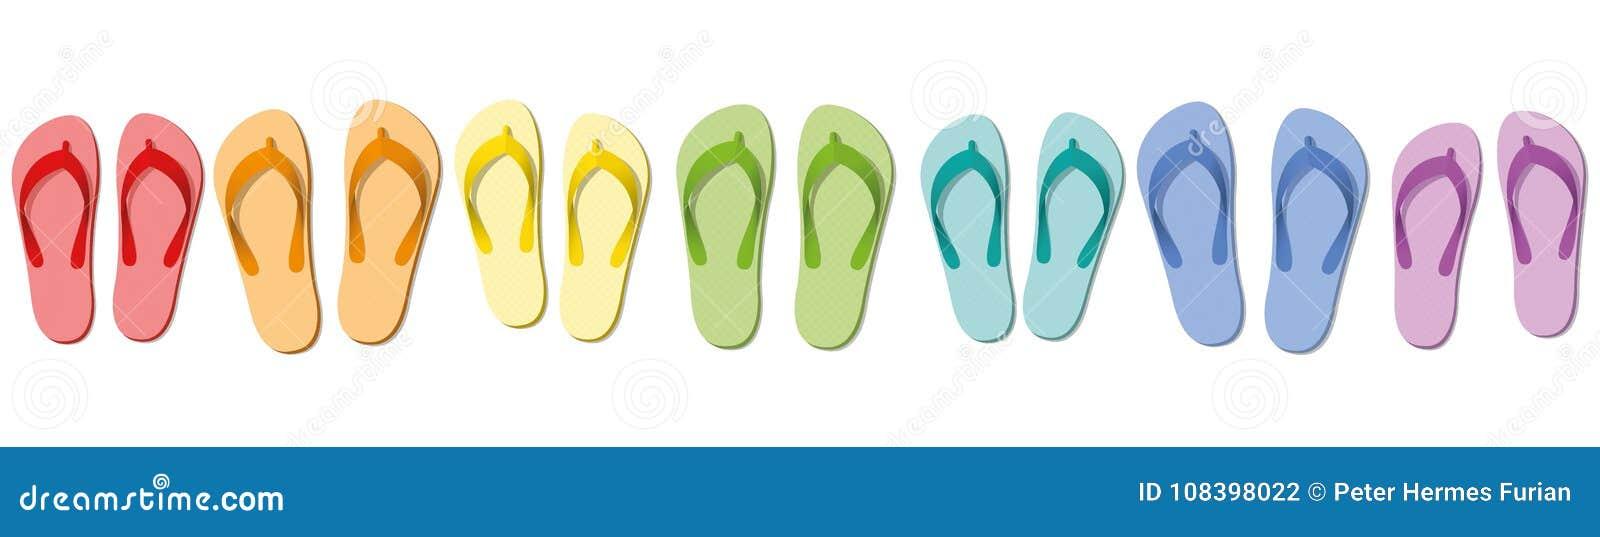 de5feef90d0 Flip Flops Colored Set Seven Sandals Stock Vector - Illustration of ...